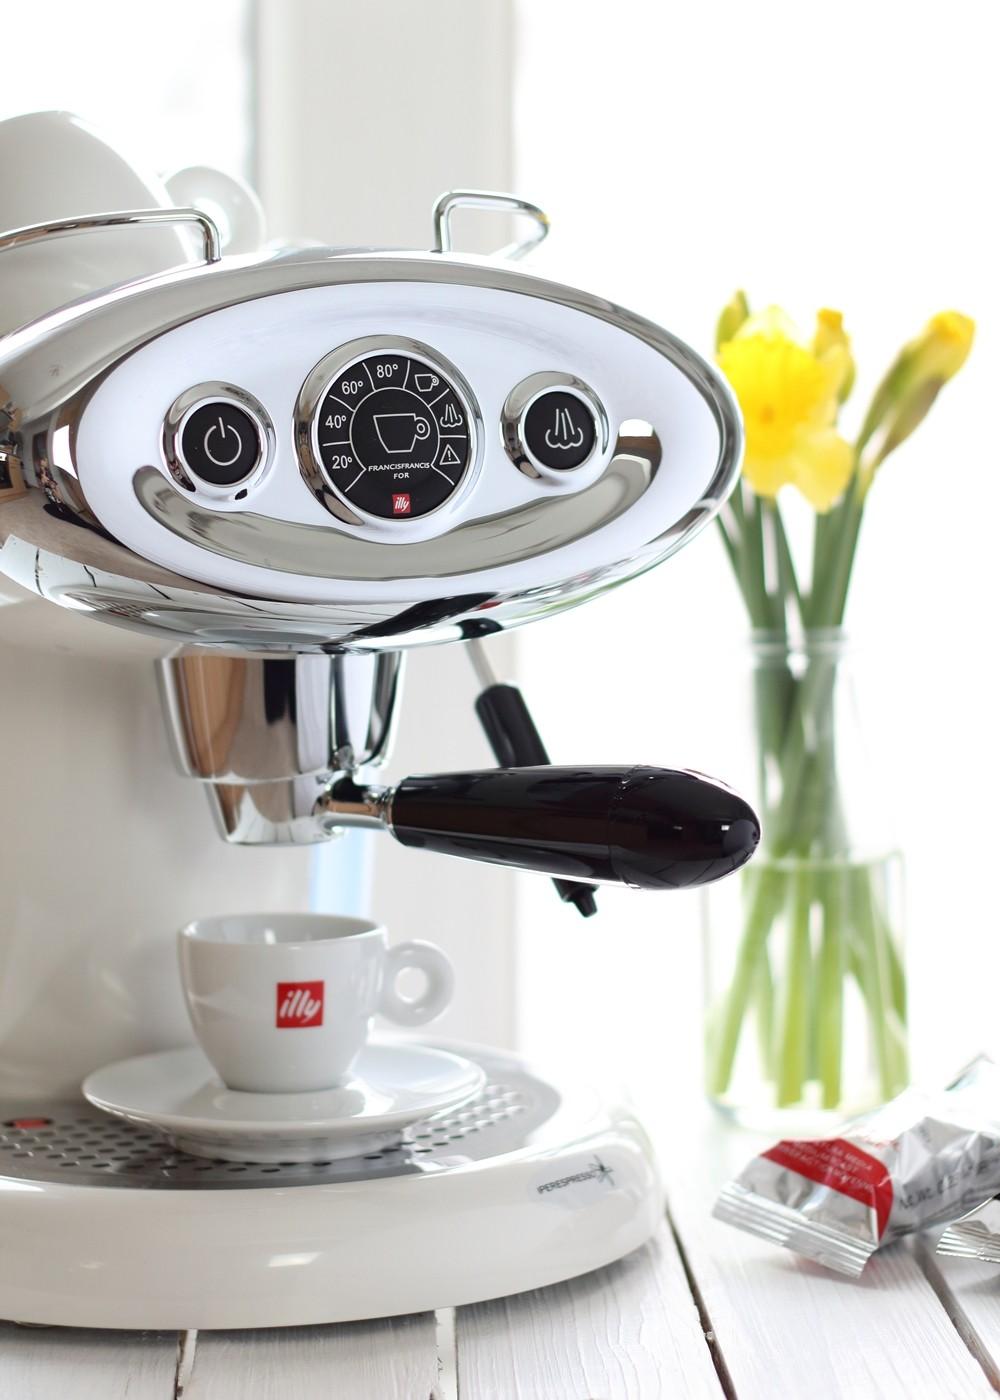 Illy Iperespresso Espressomaschine weiss 3